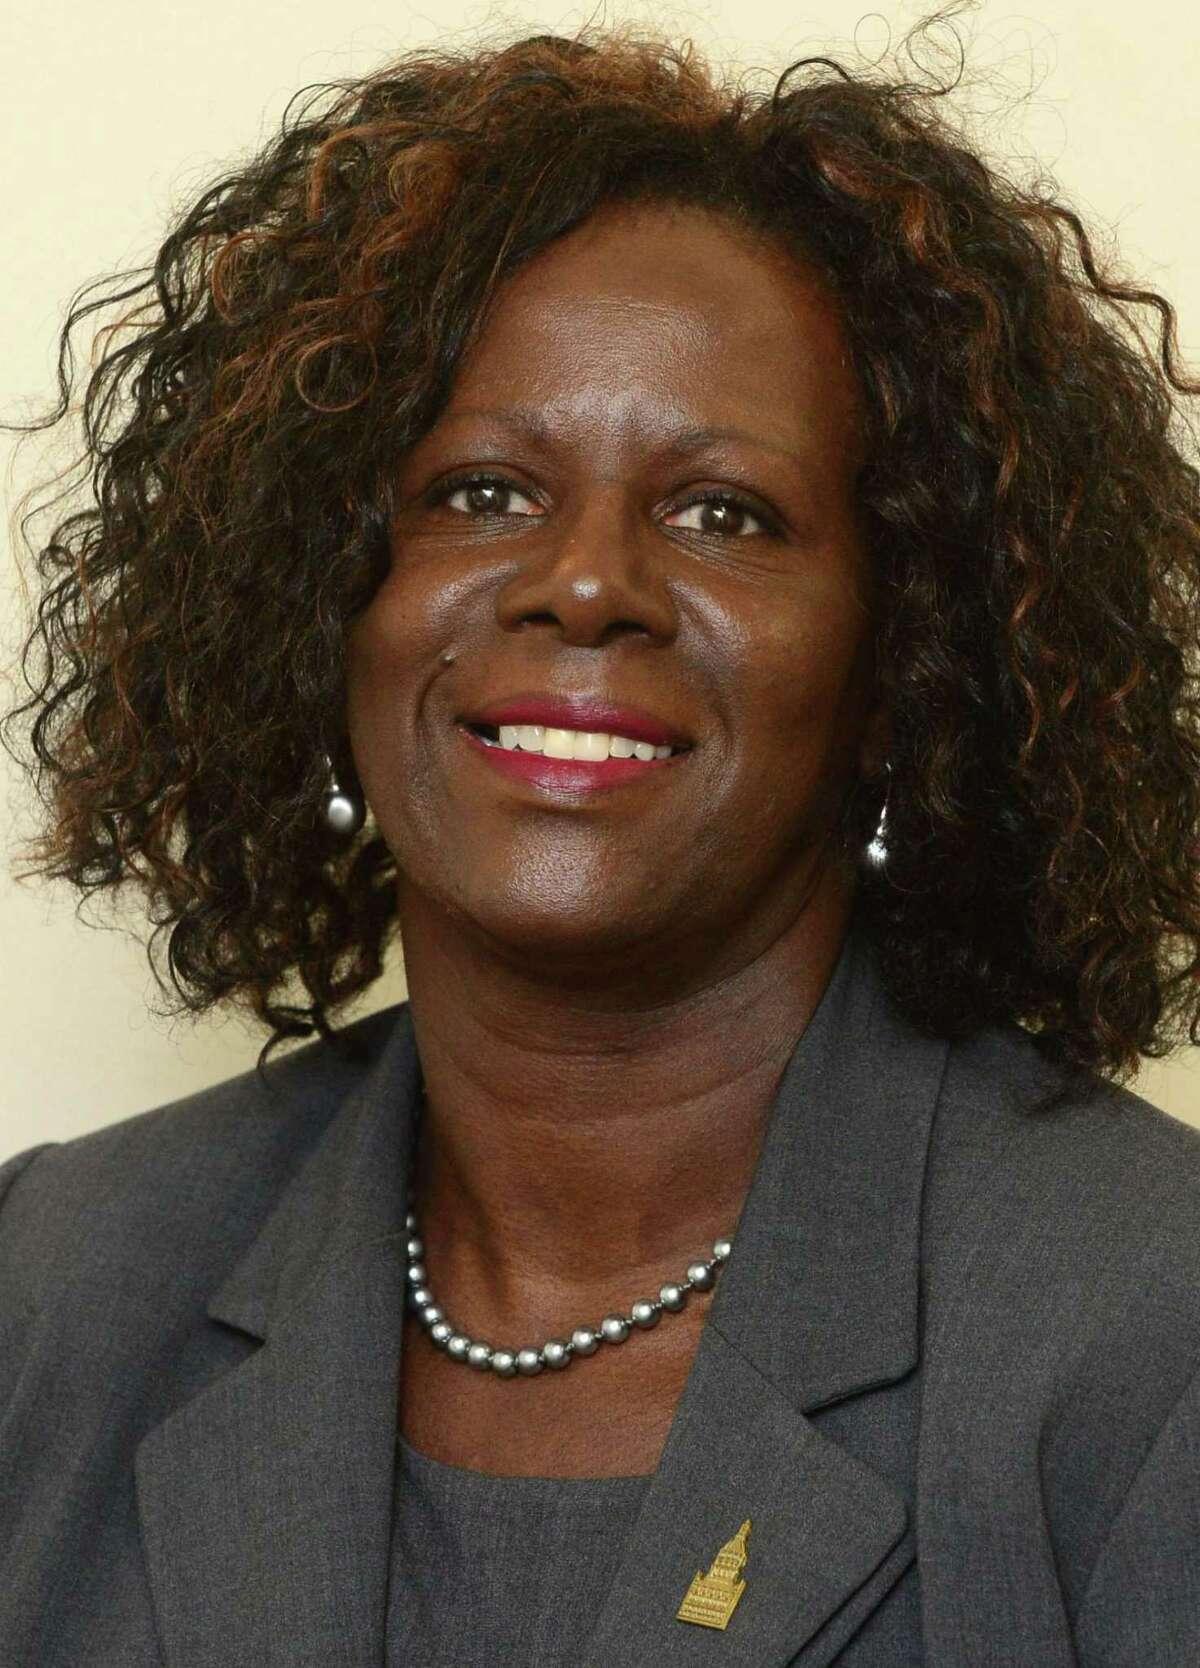 State Representative Patricia Billie Miller (D-Conn)